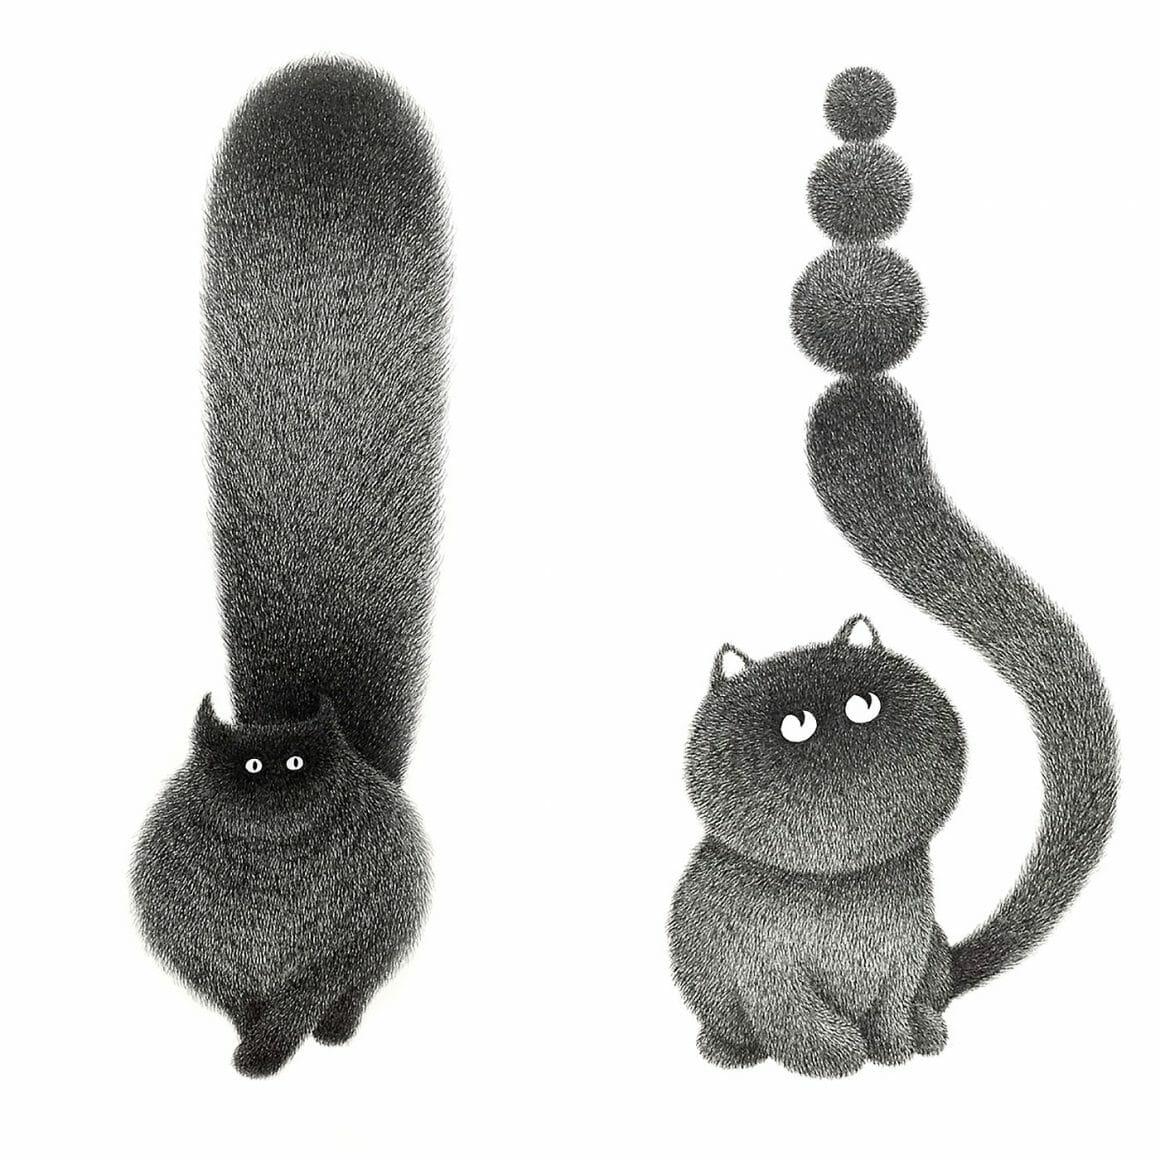 Dessin de chats de l'artiste Kamwei Fong